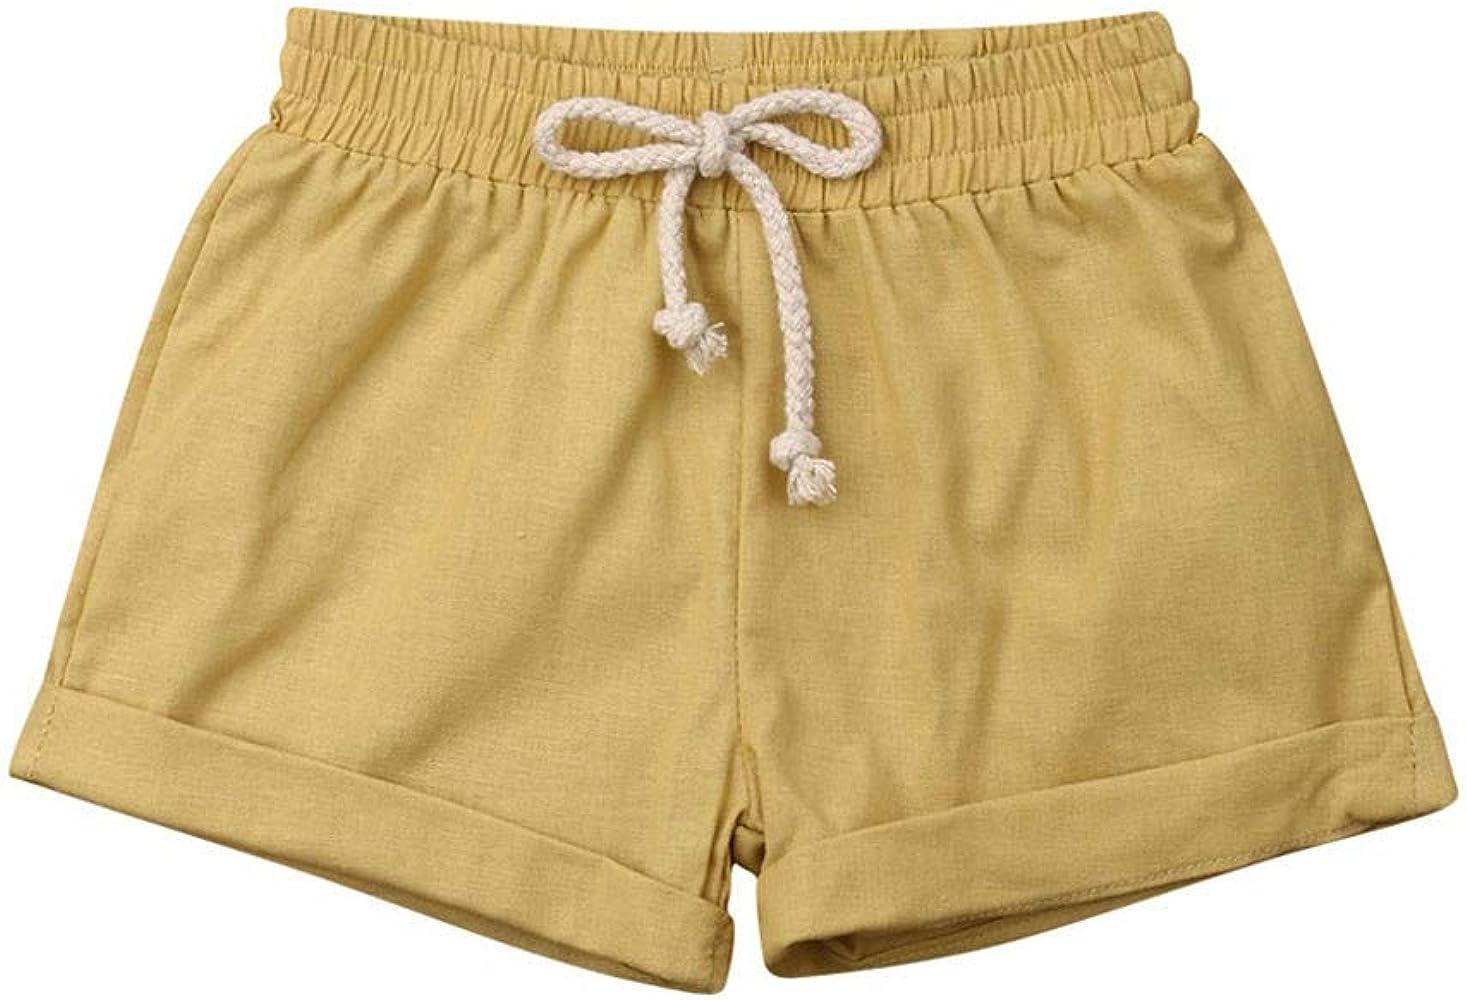 Amlaiworld Pantalones Cortos de Verano para niños, Niños niñas ...